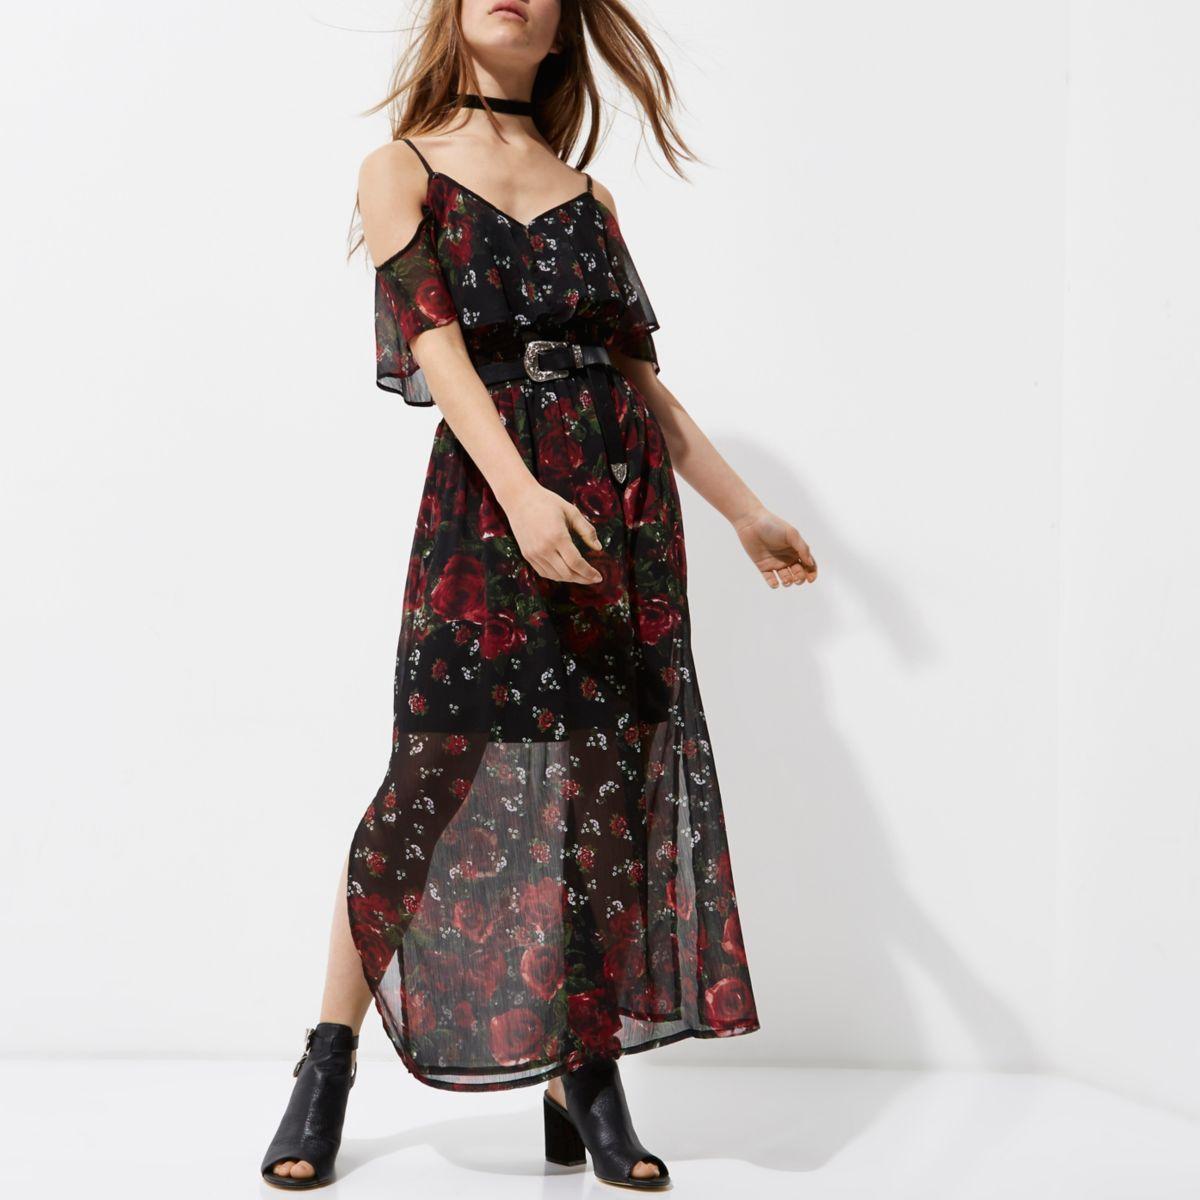 Petite black cold shoulder floral maxi dress